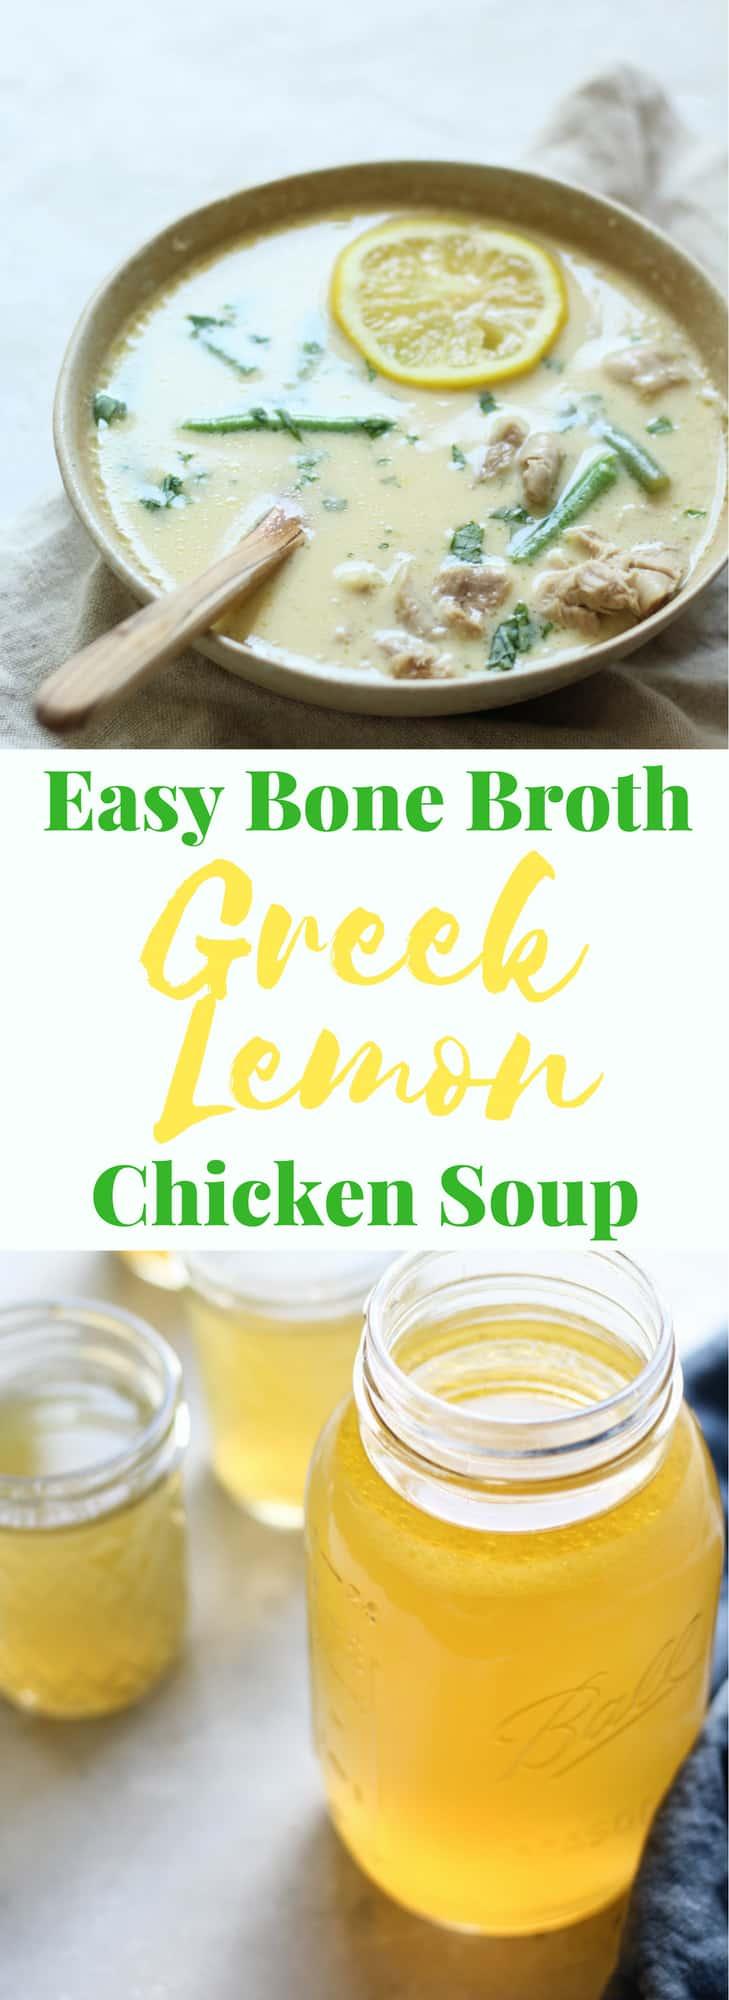 Easy Greek Lemon Chicken Soup Recipe with Bone Broth